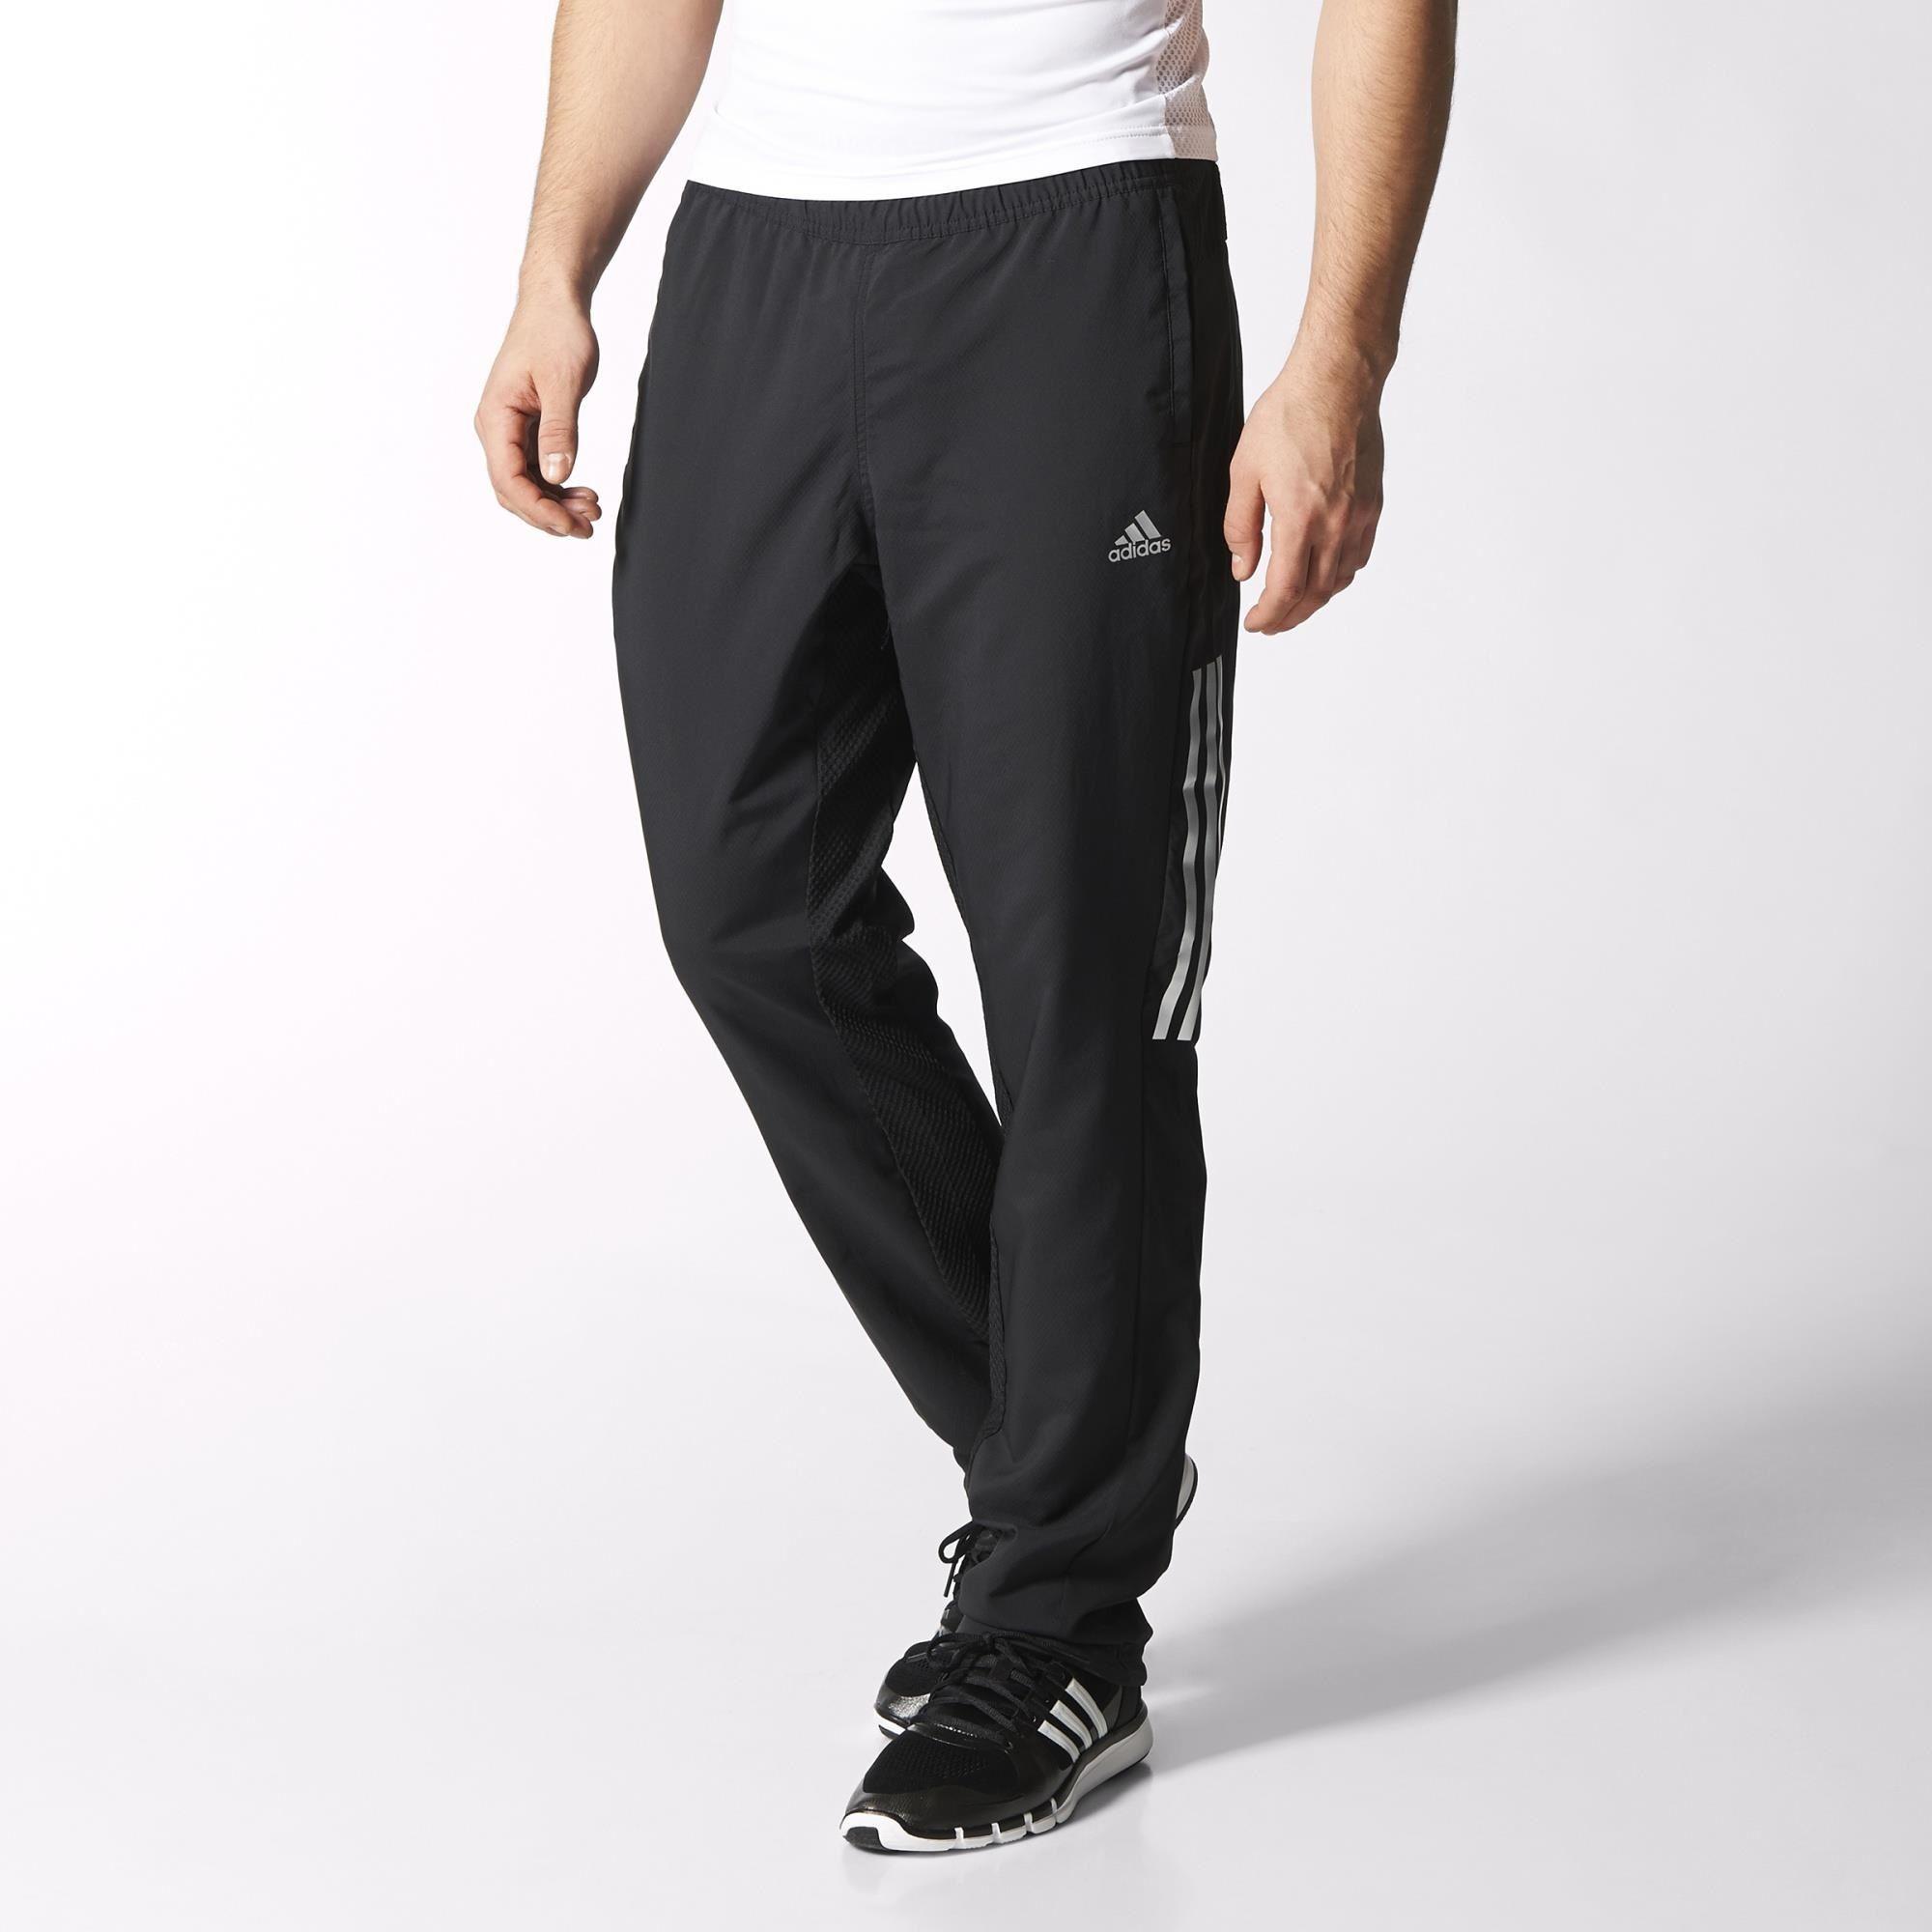 adidas Cool365 Woven Pants | Apparel: For Men | Adidas